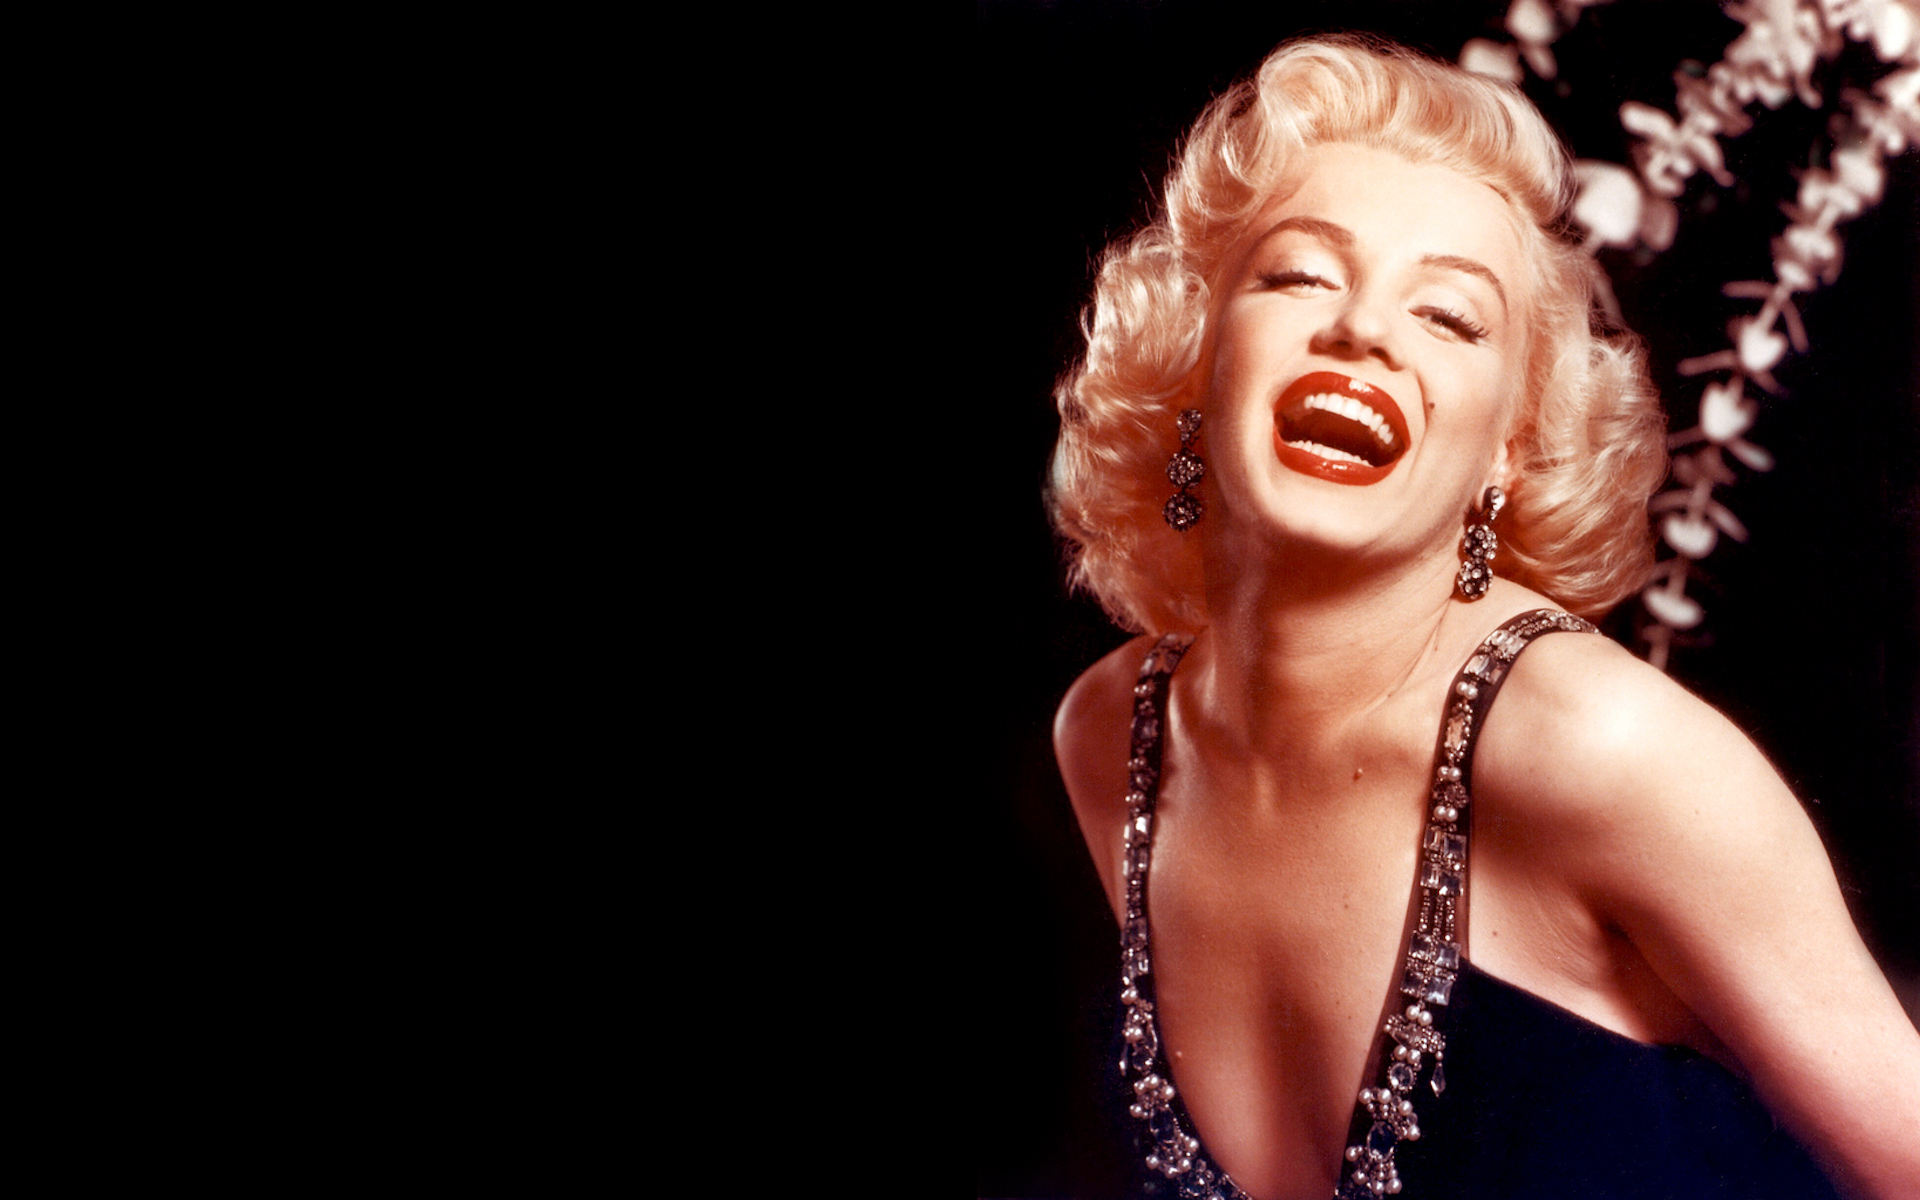 Free Download Marilyn Monroe Wallpaper For Bedroom Walls 3